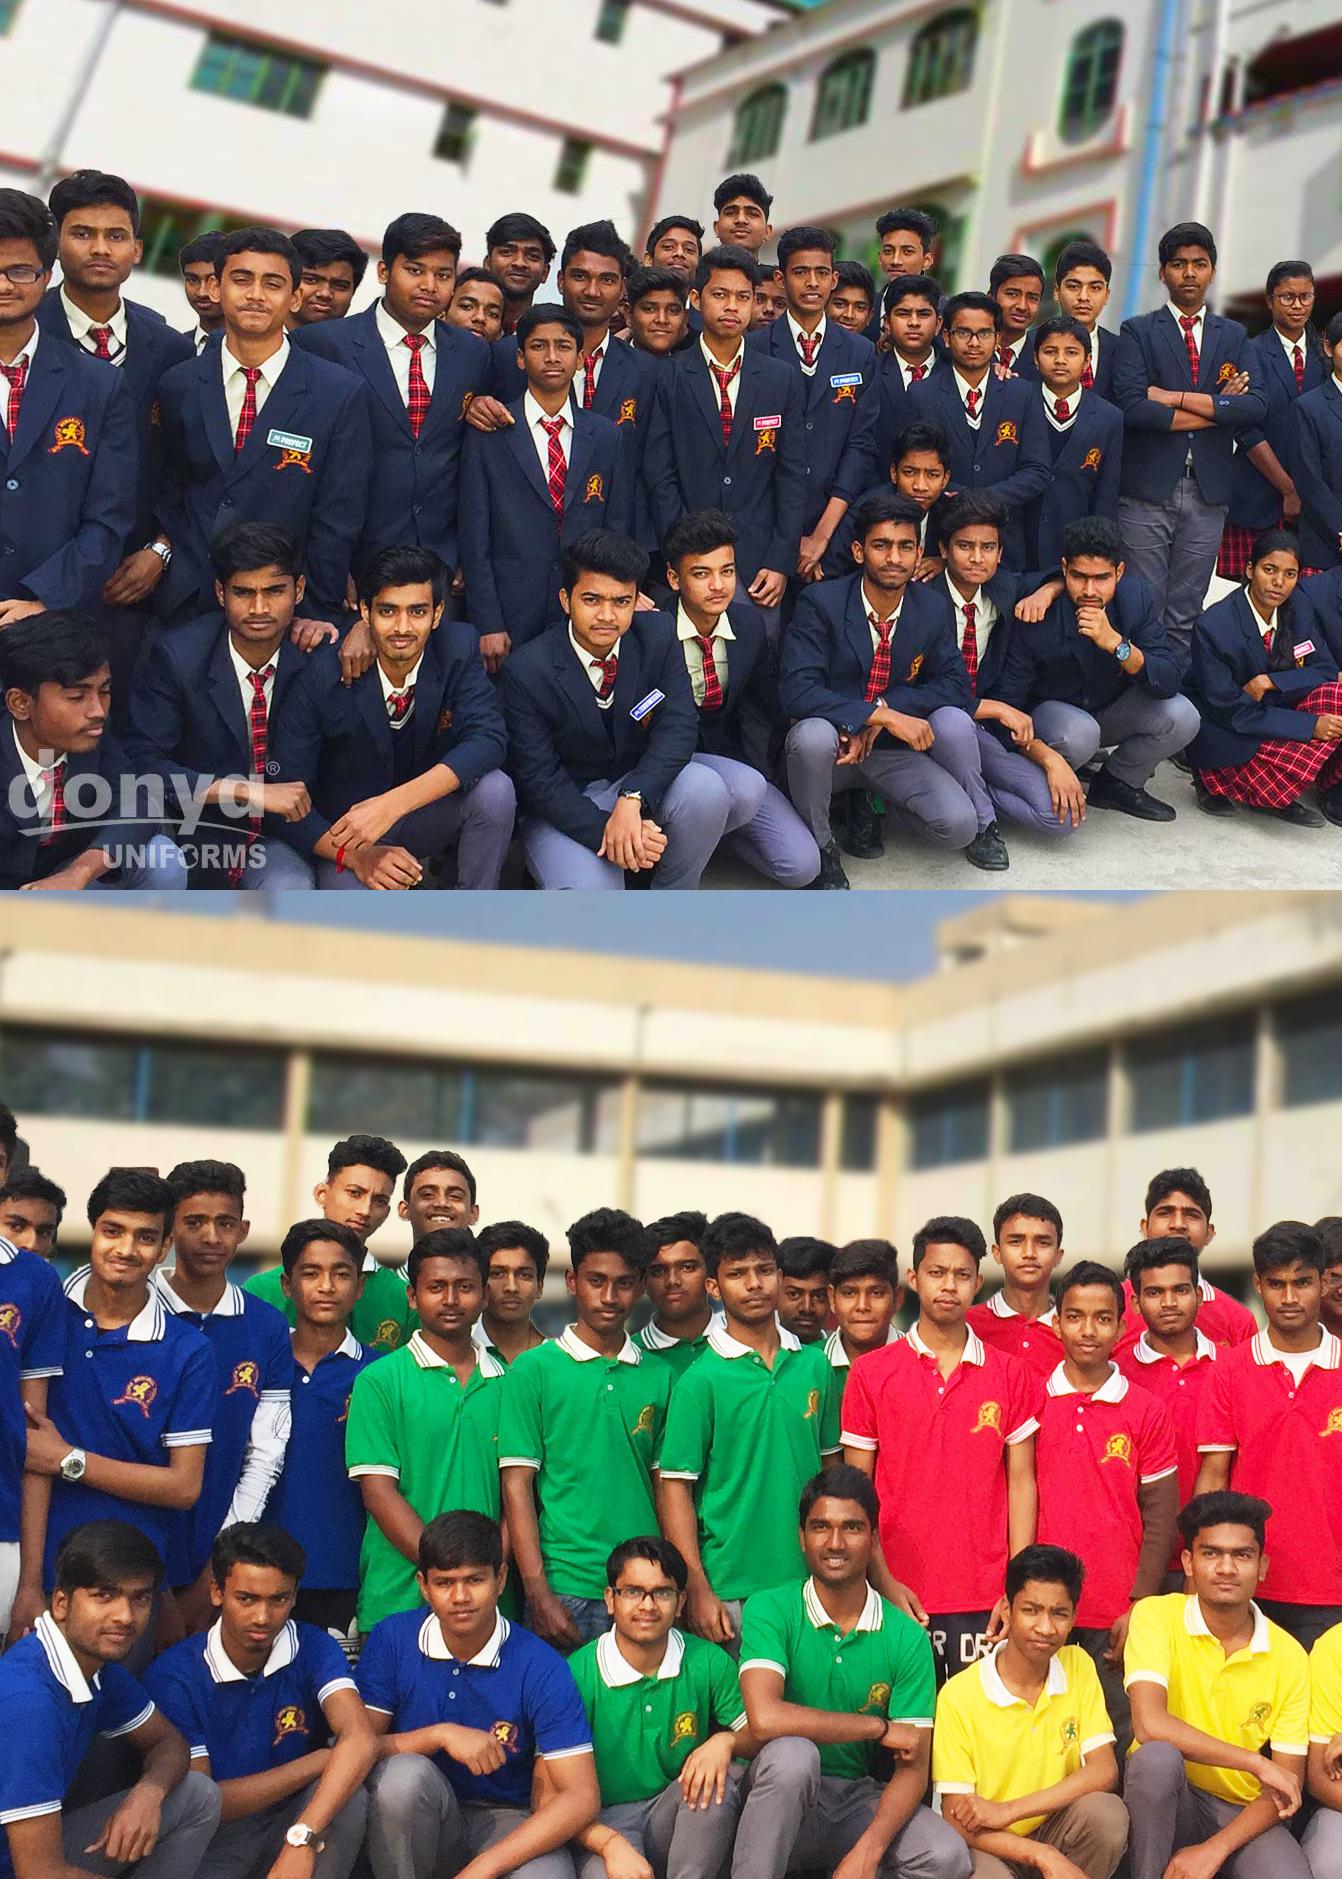 School Uniform House T Shirt in India, West Bengal, Kolkata, Delhi, Mumbai, Siliguri, Malda,